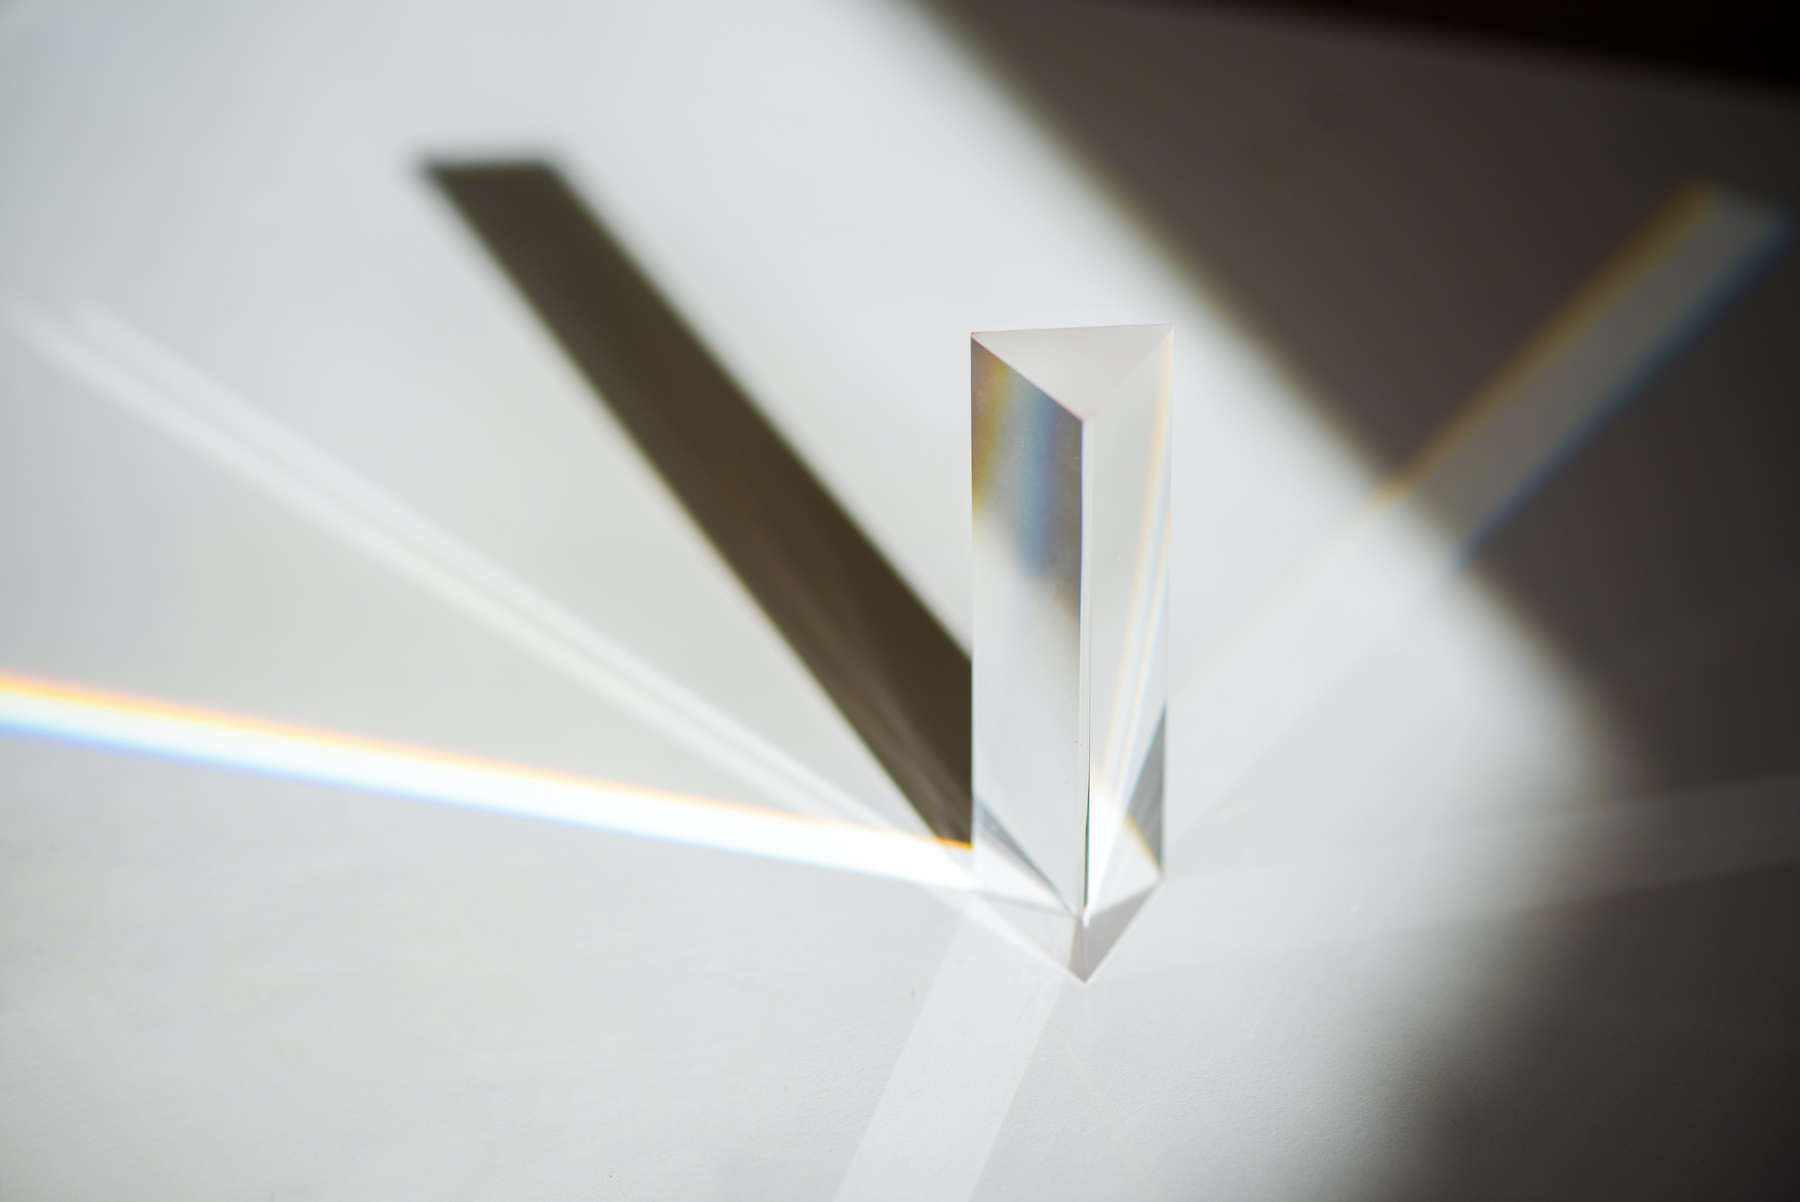 Prism light color effect